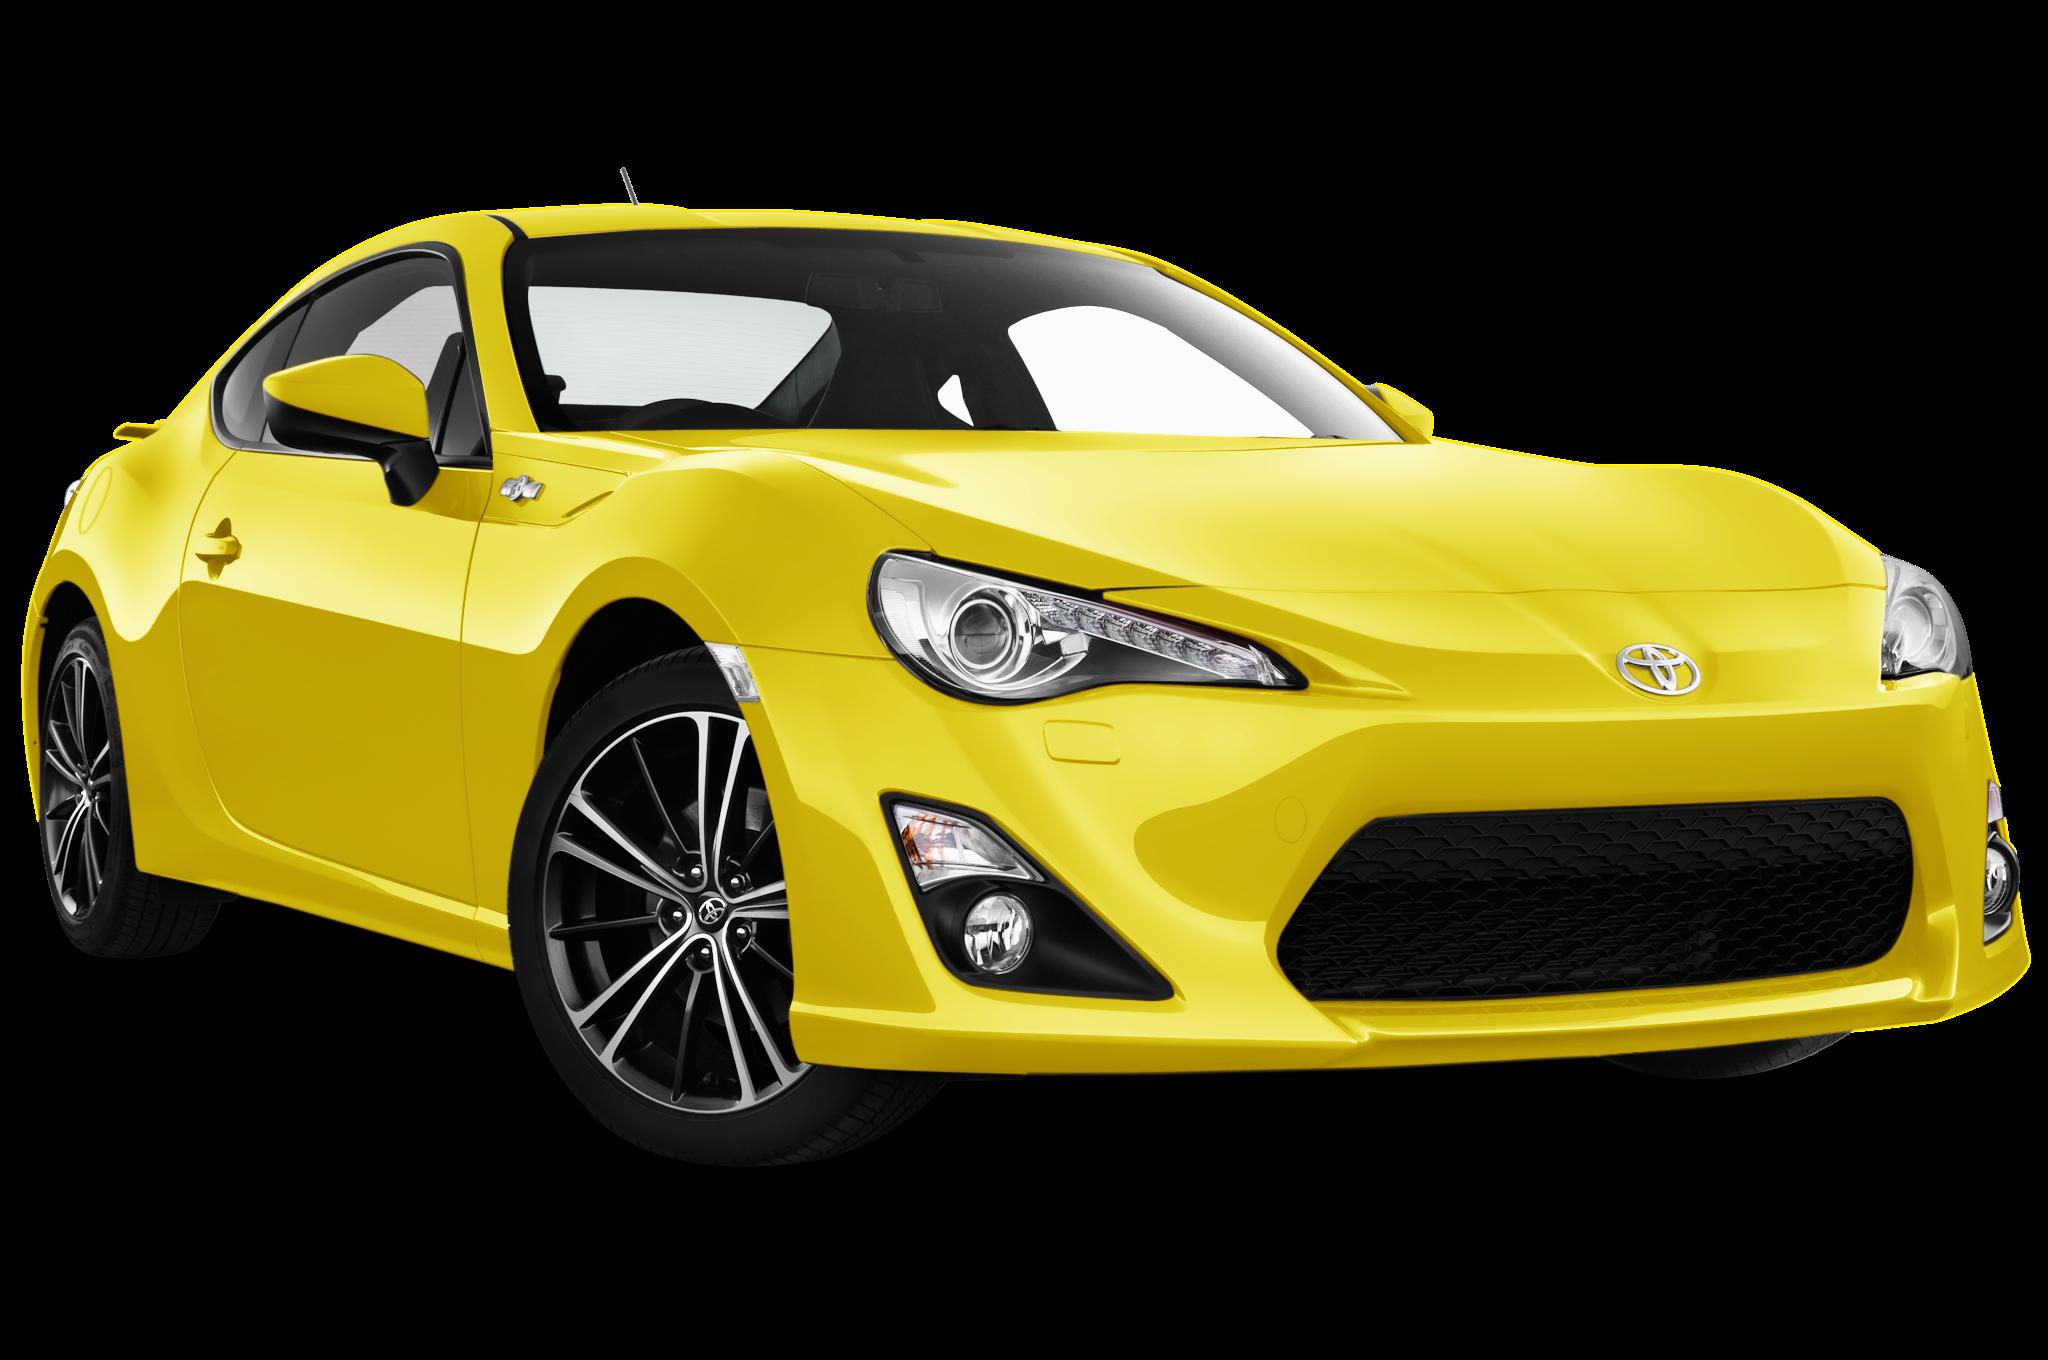 Scion Frs Lease >> Toyota Gt86 Business Car Lease Deals